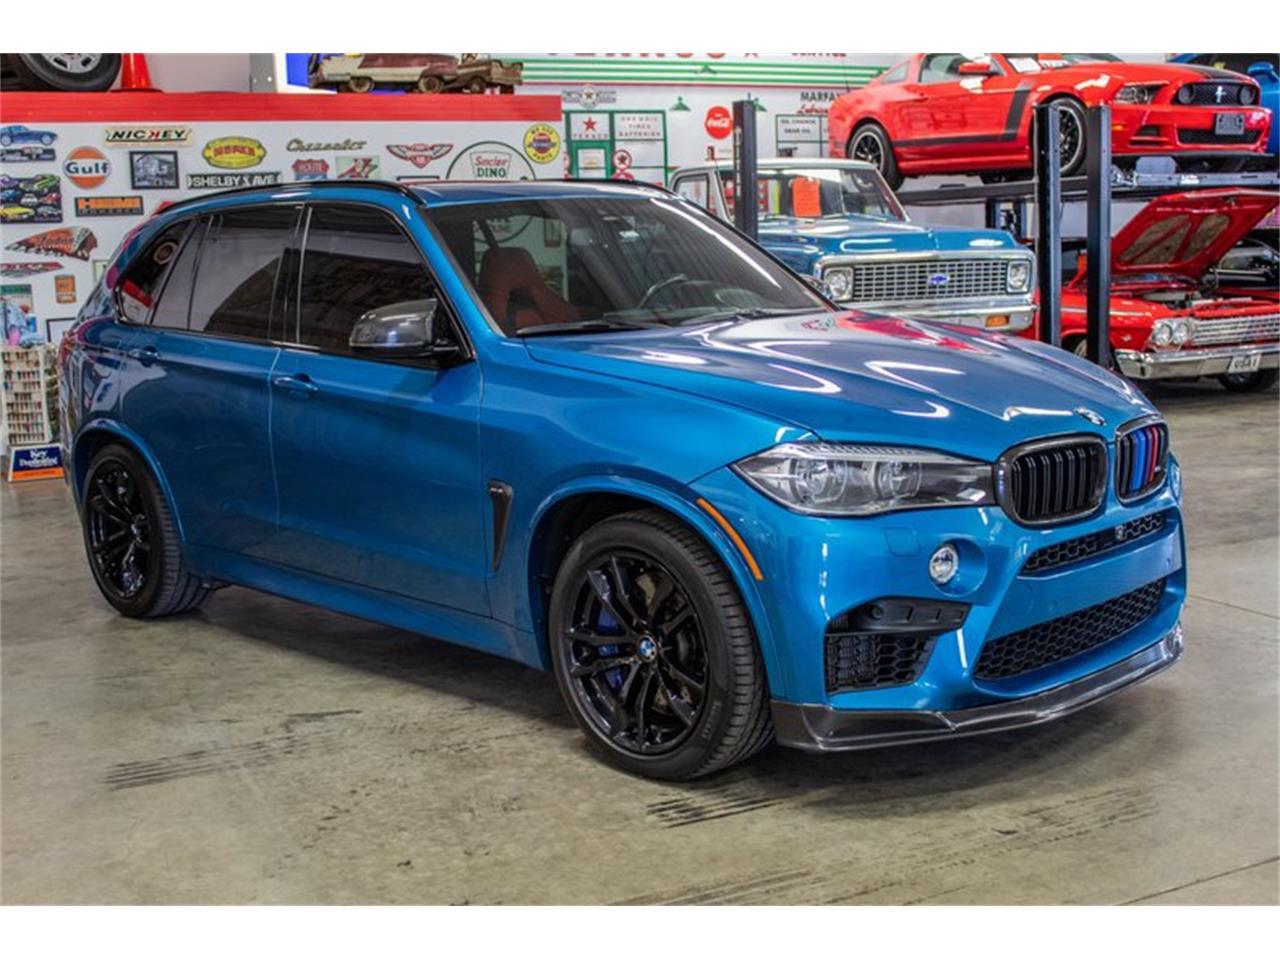 Large Picture of '17 BMW X5 located in Michigan - $61,990.00 - QAOC